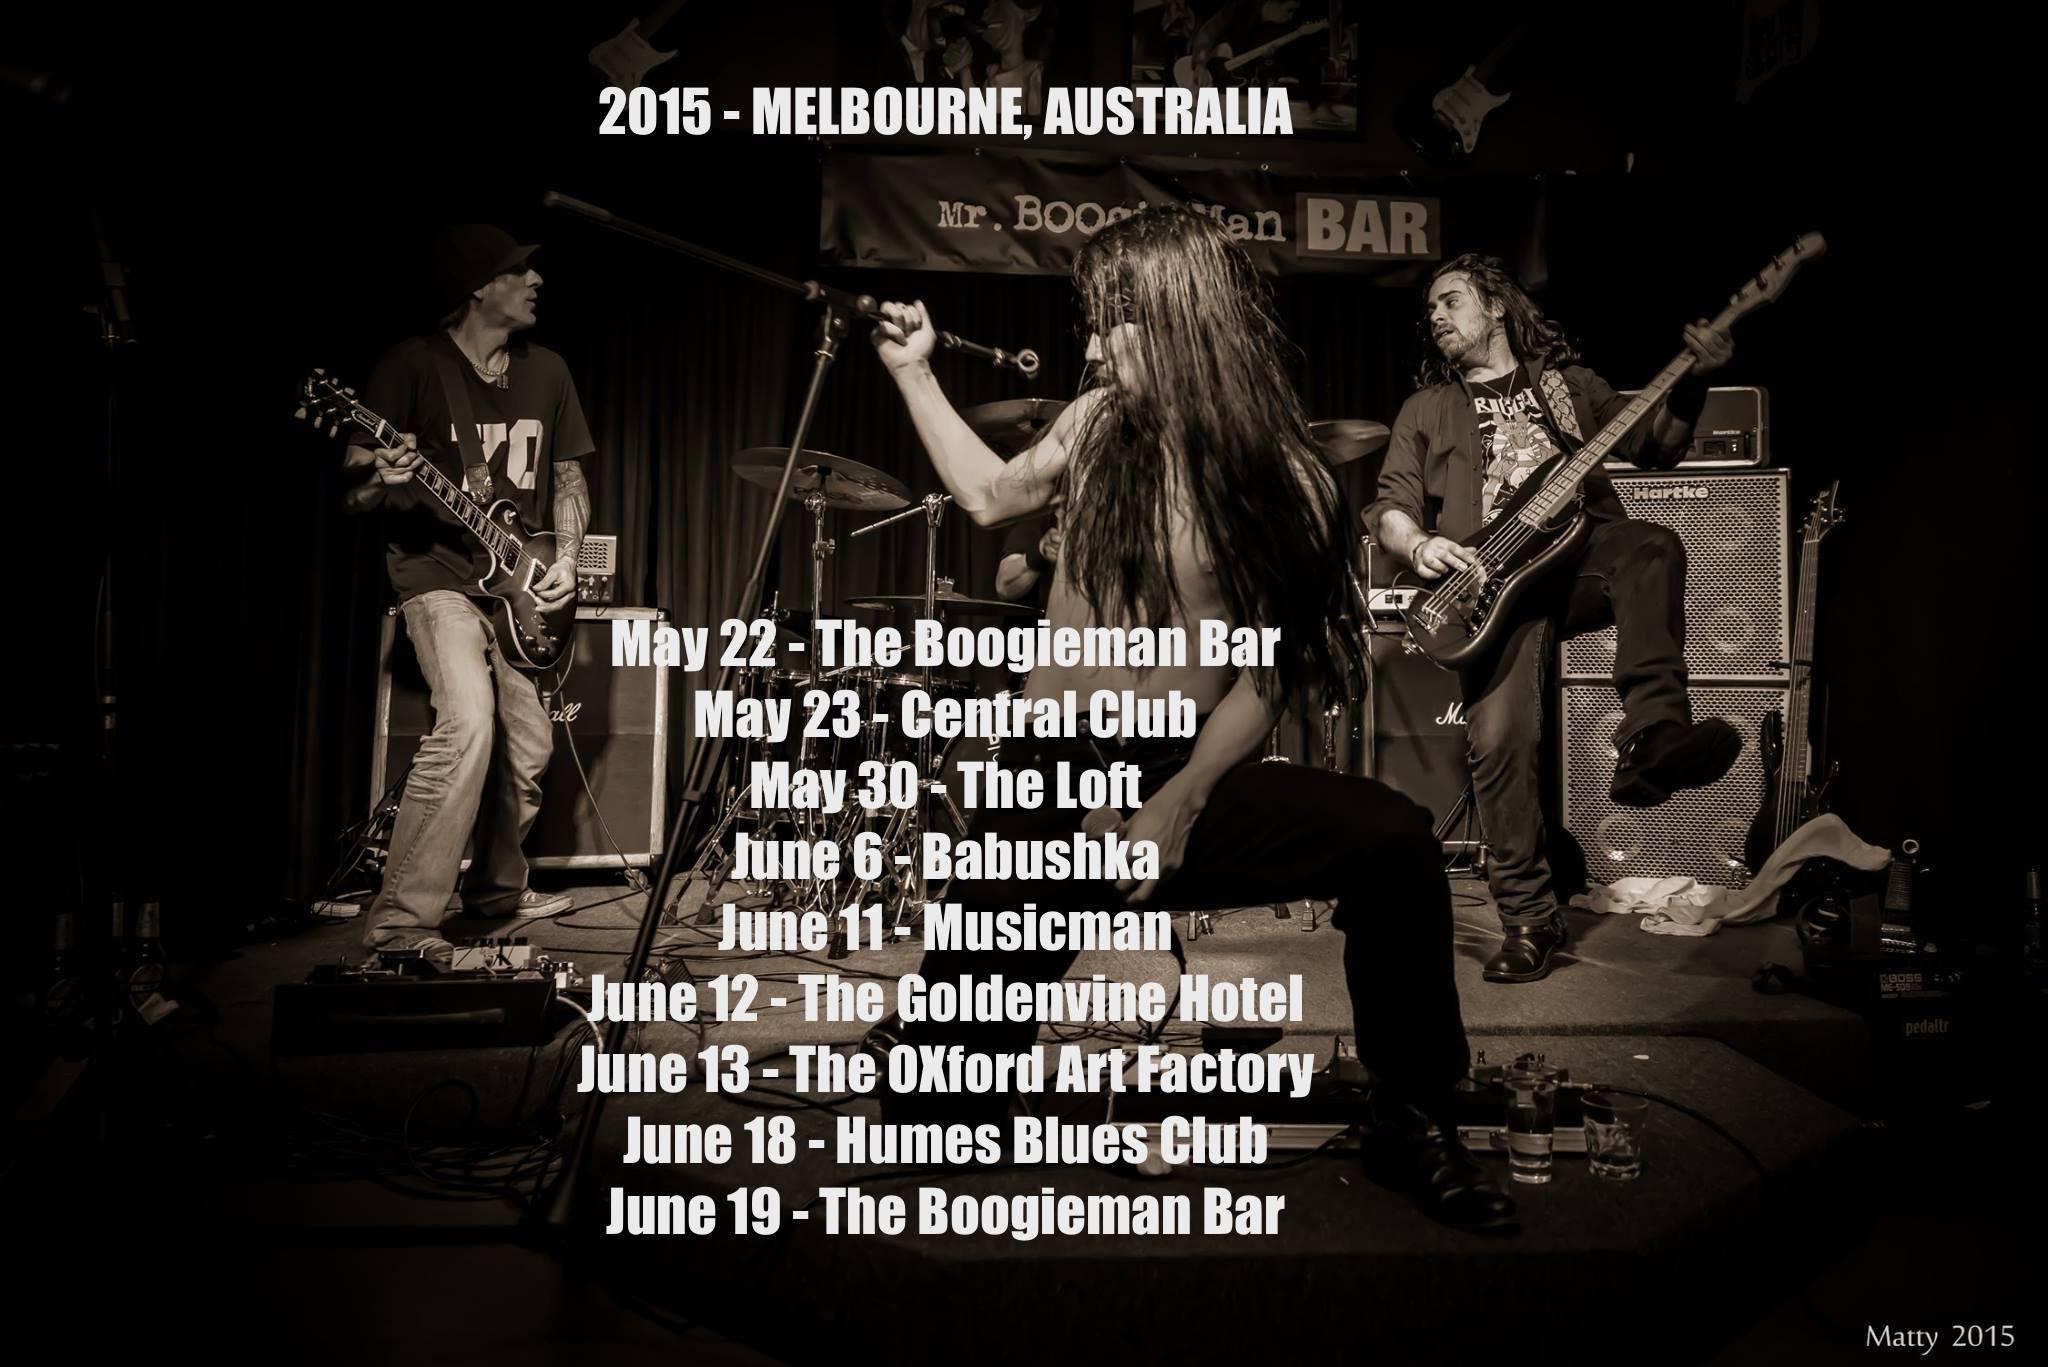 2015 - MELBOURNE AUSTRALIA